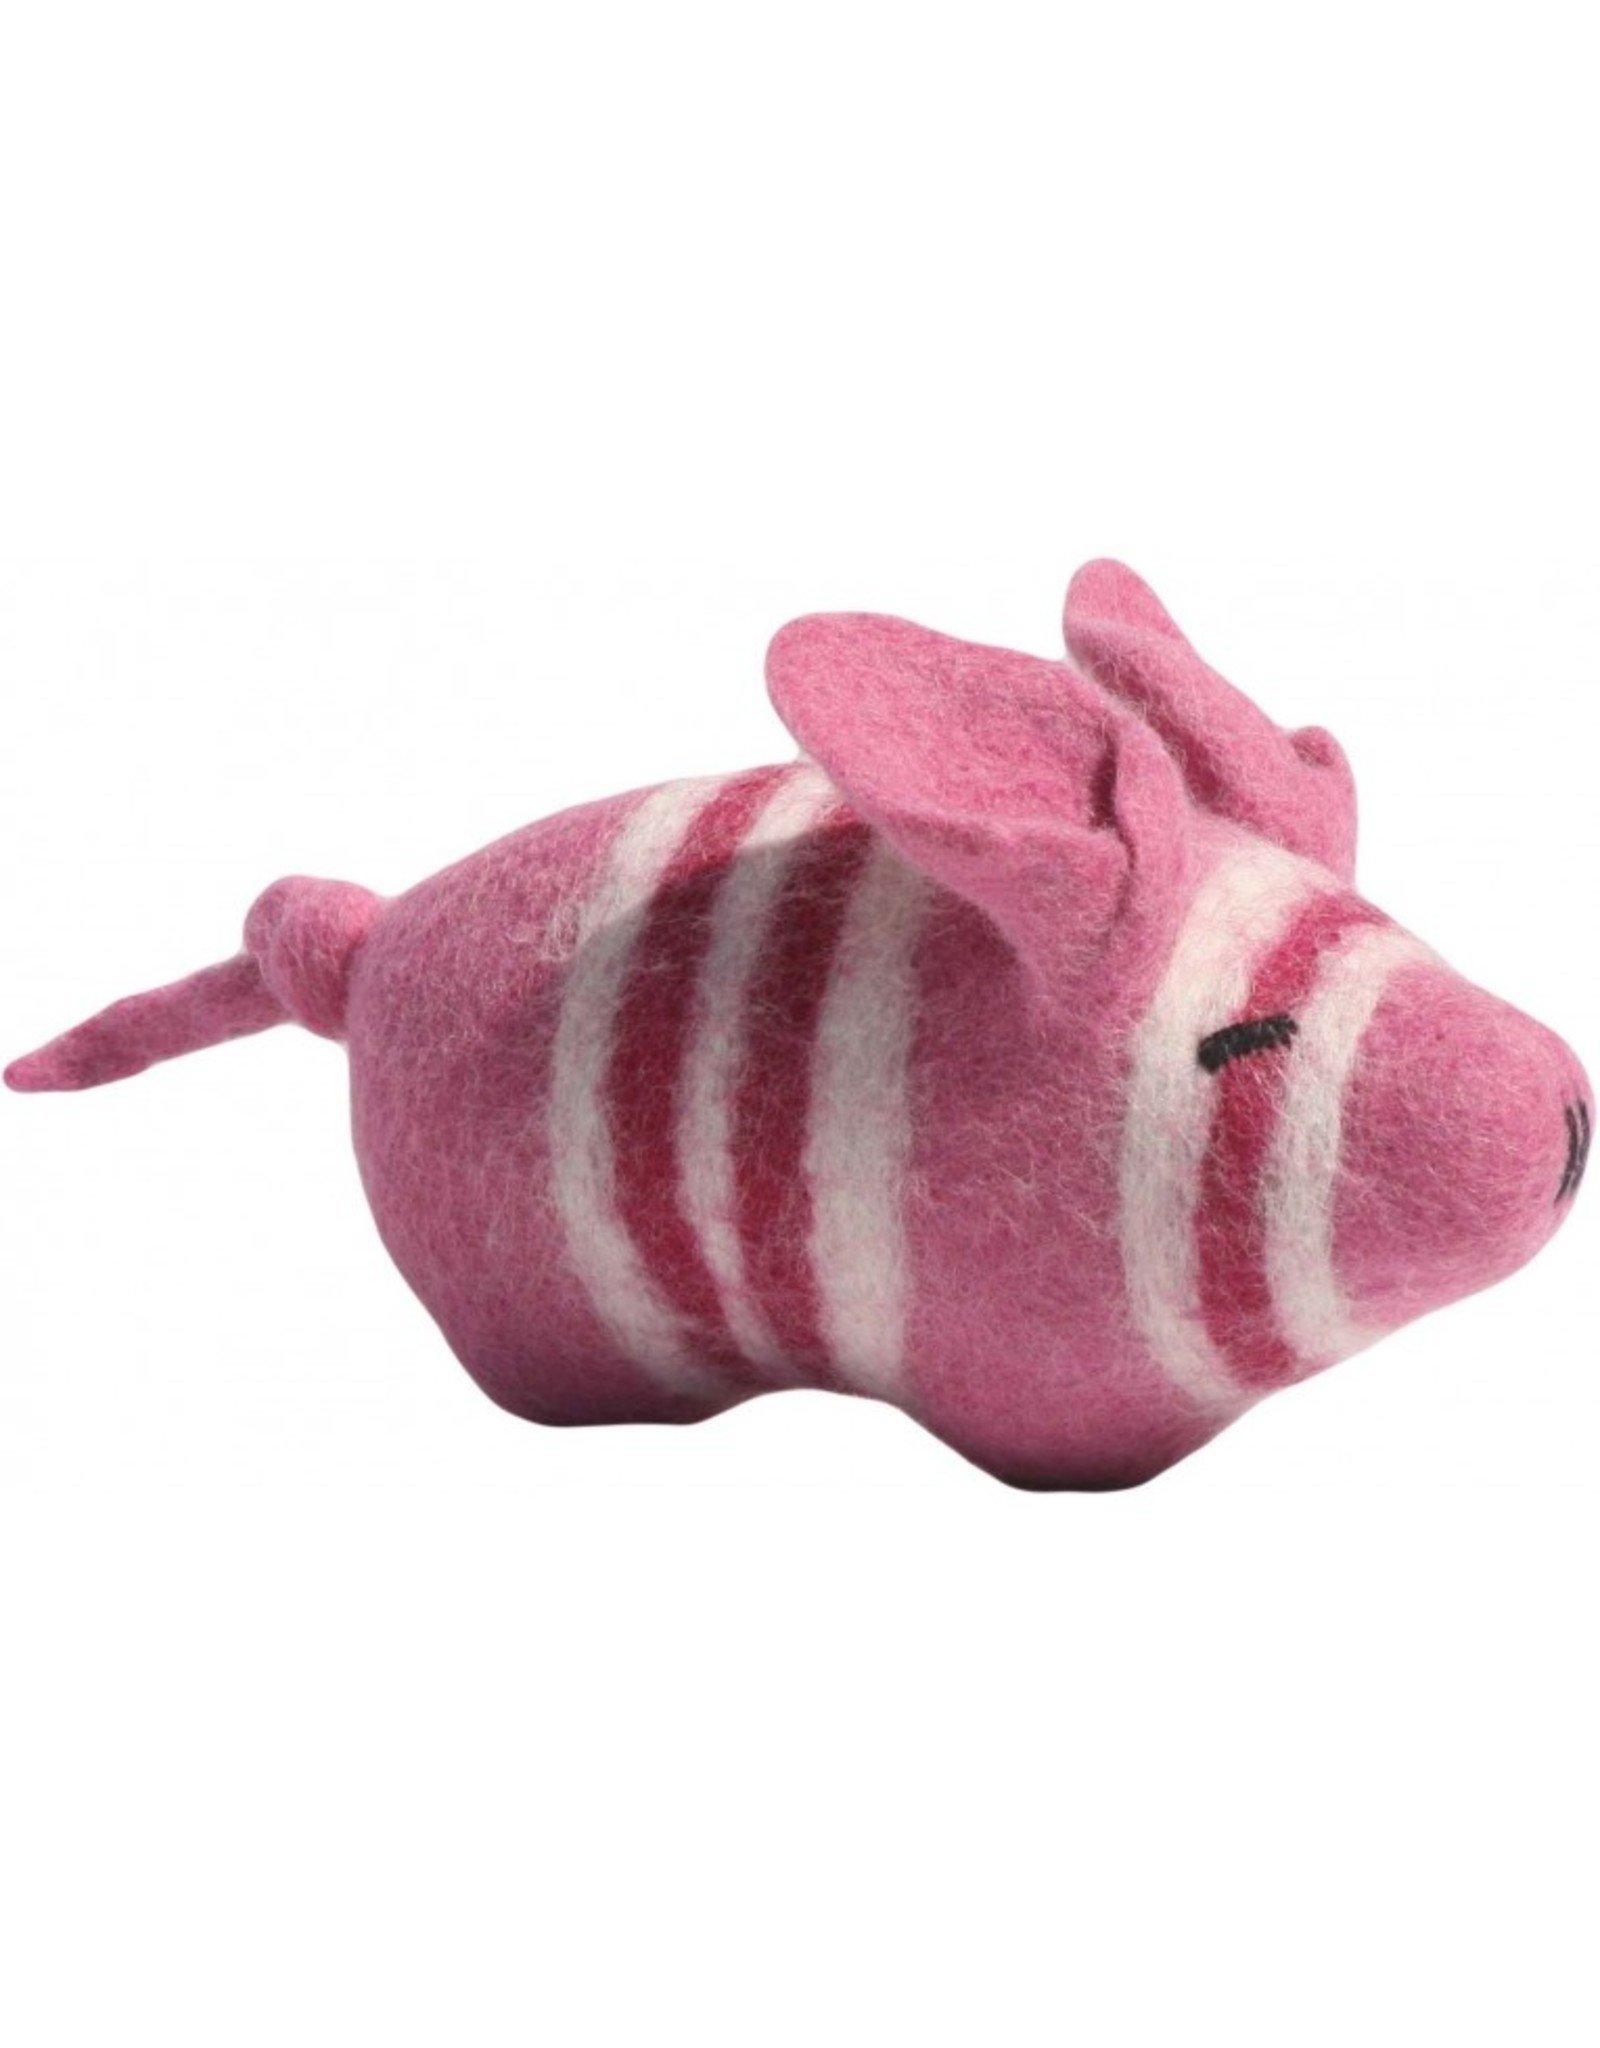 Lollycadoodle Lollycadoodle Wool Pig